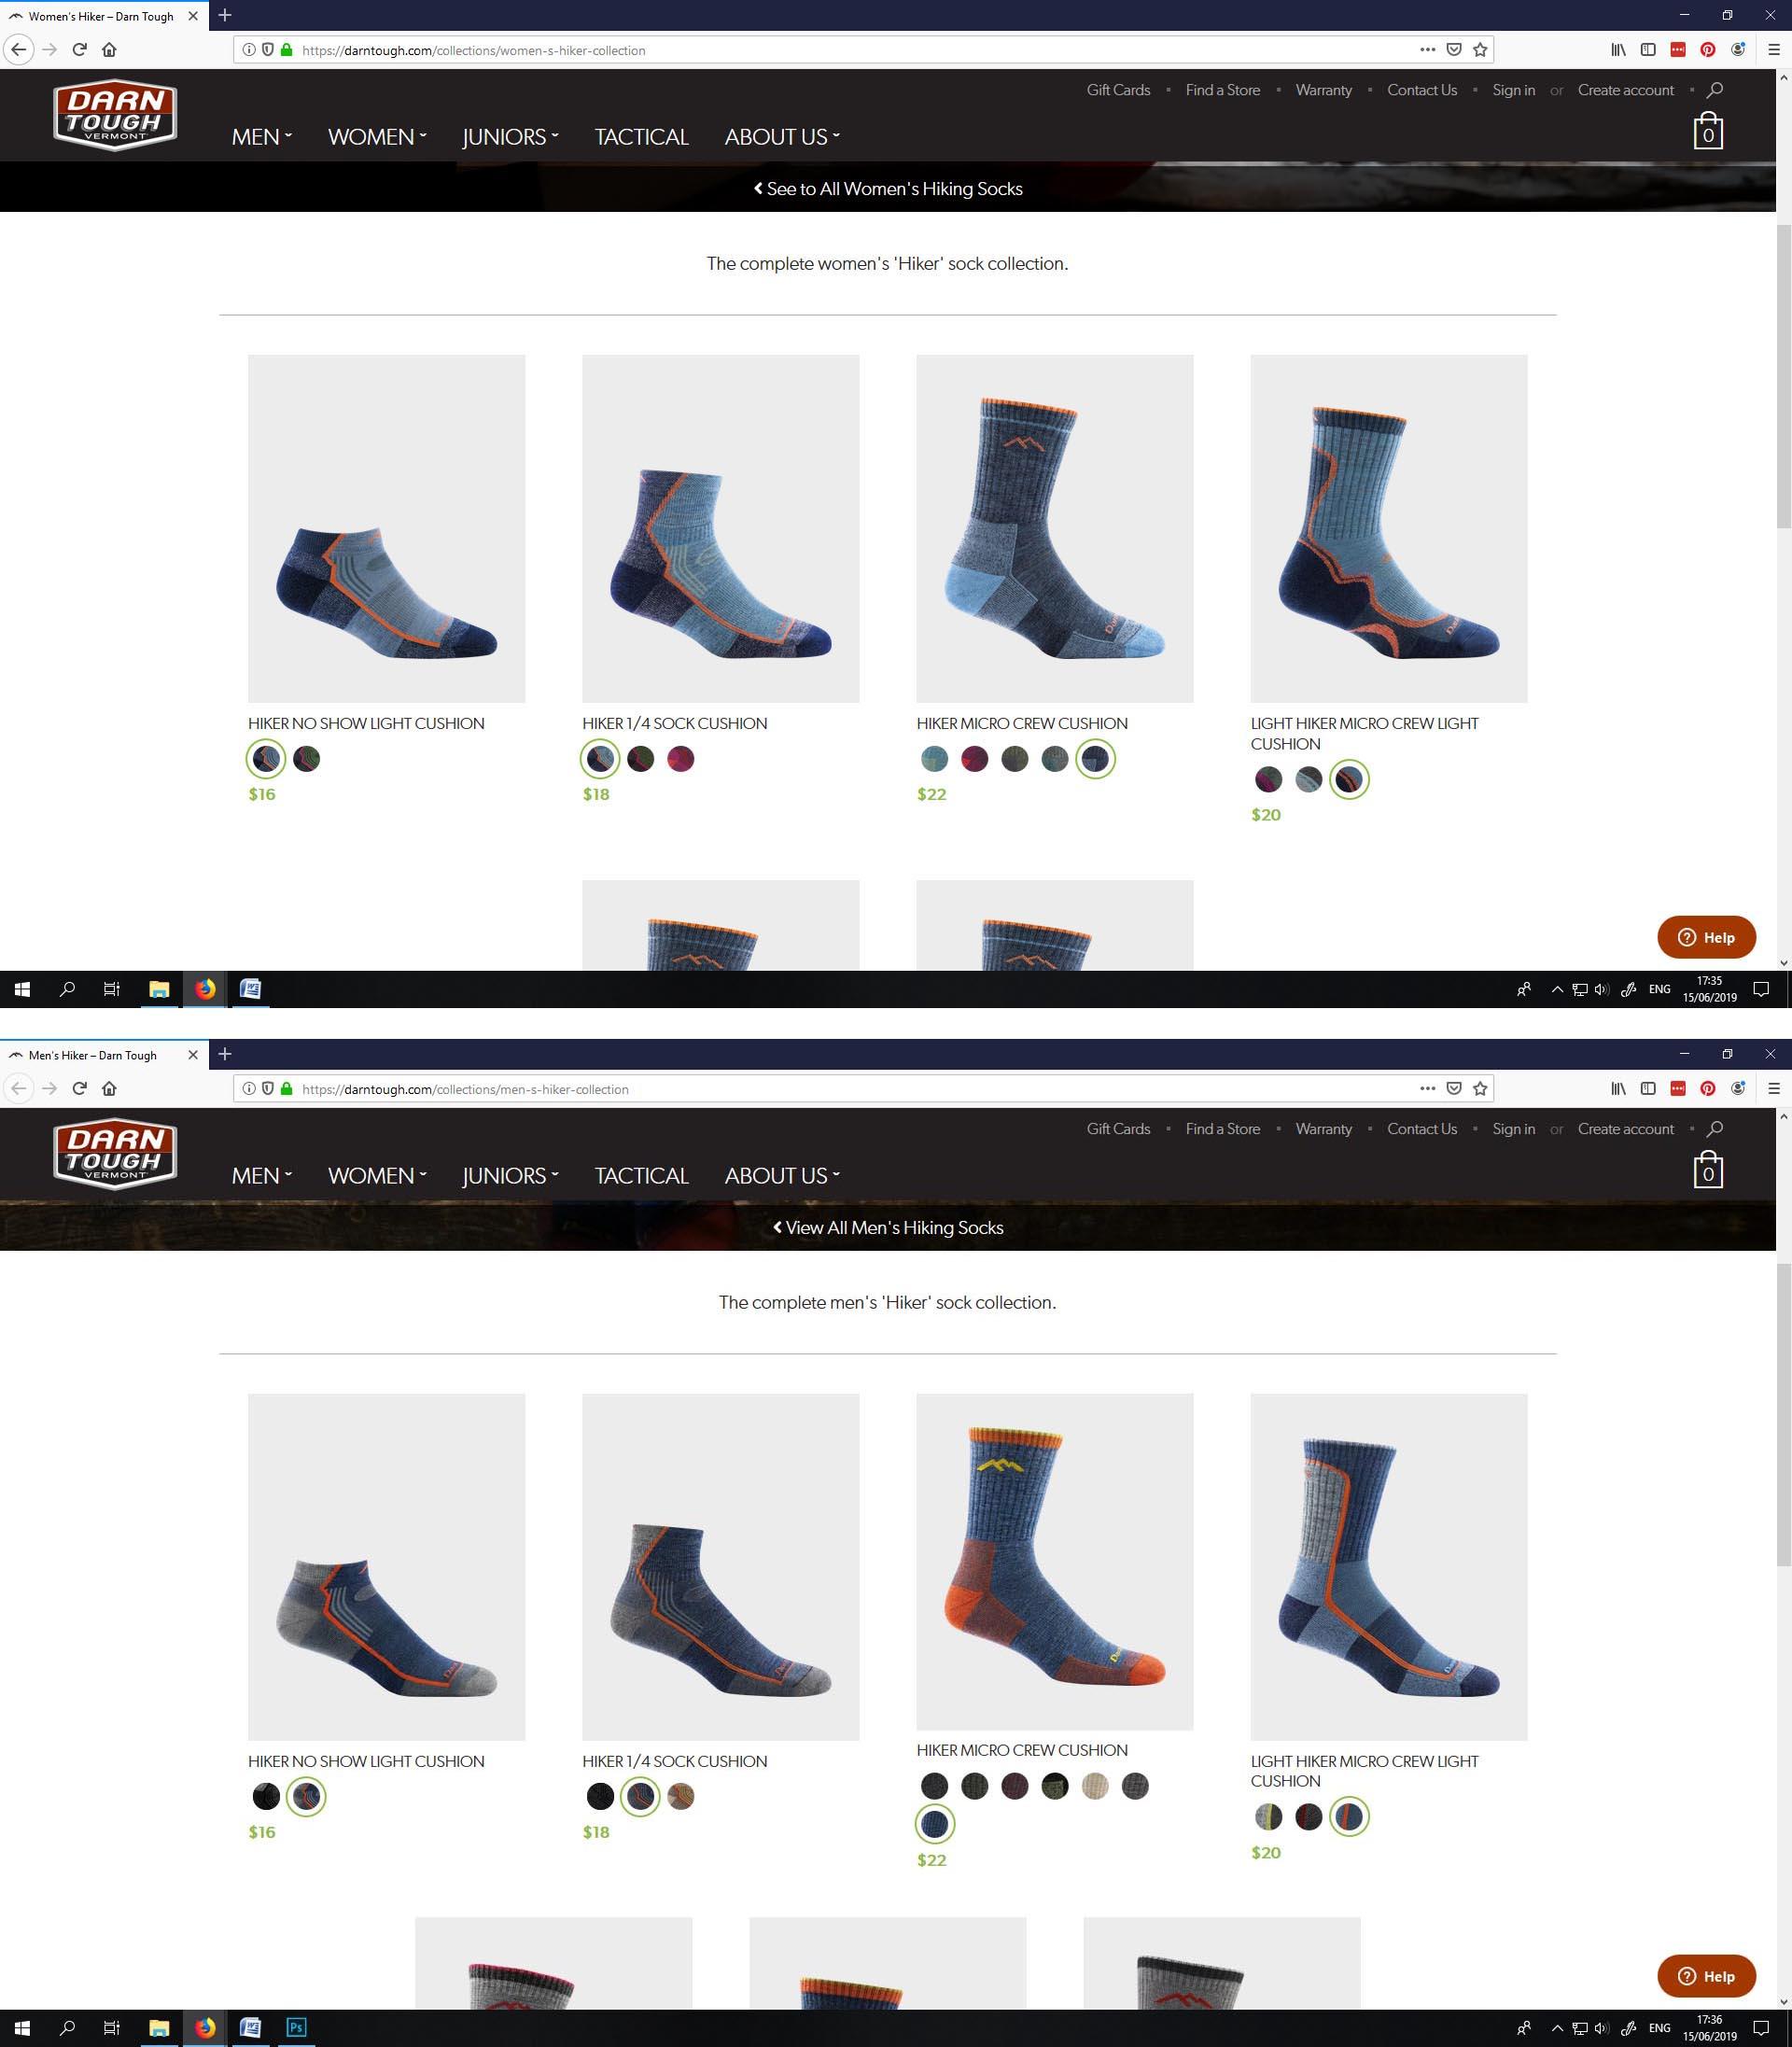 Women's hiking socks versus men's hiking socks. Now spot the difference!